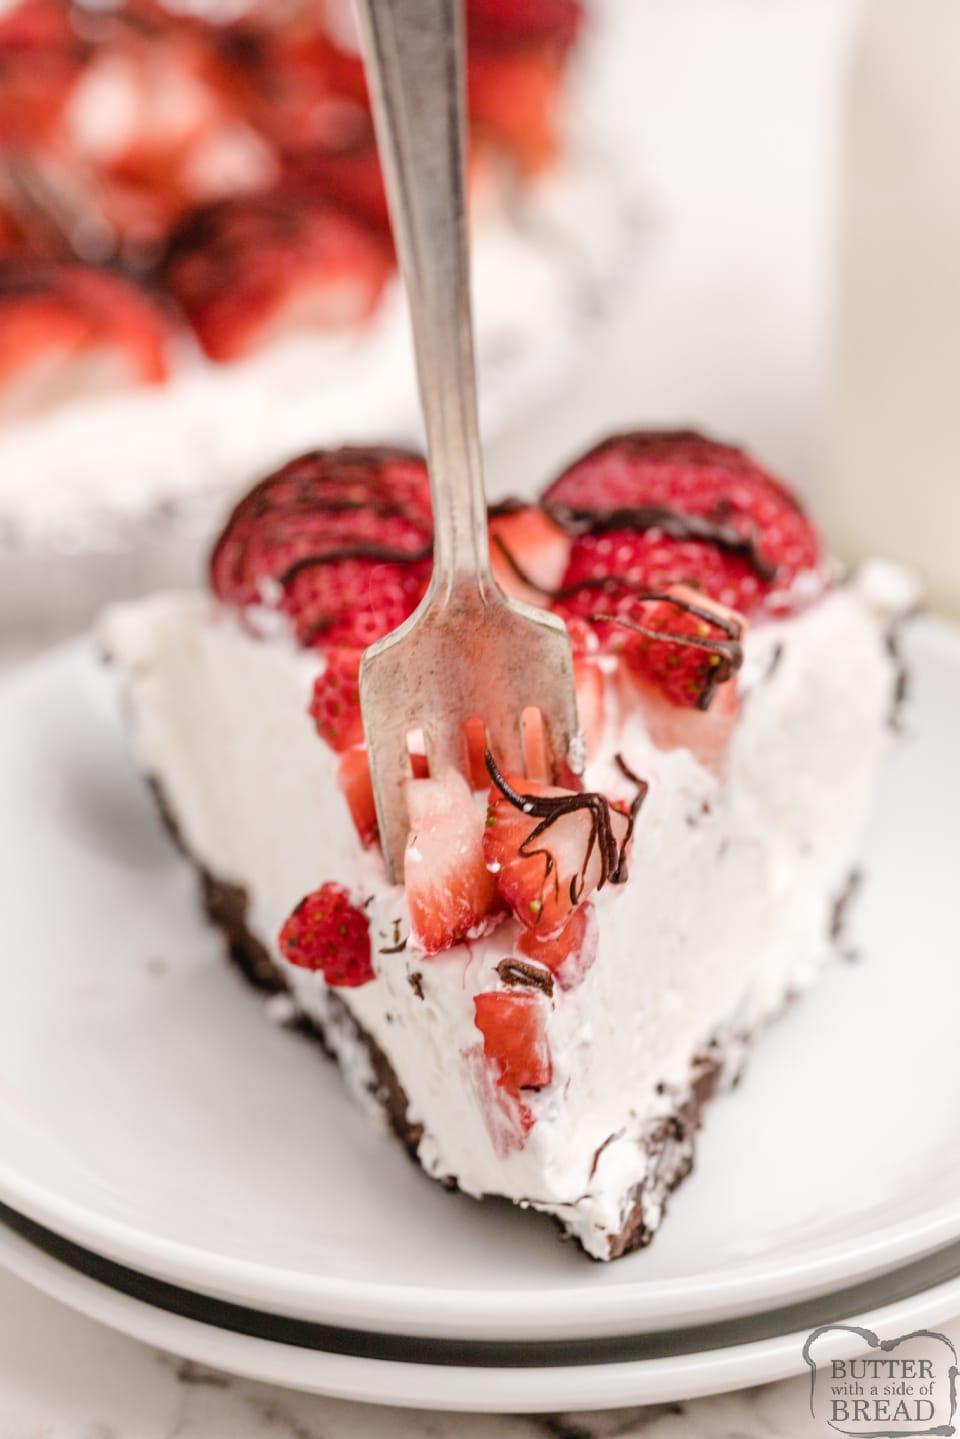 Bite of creamy strawberry pie